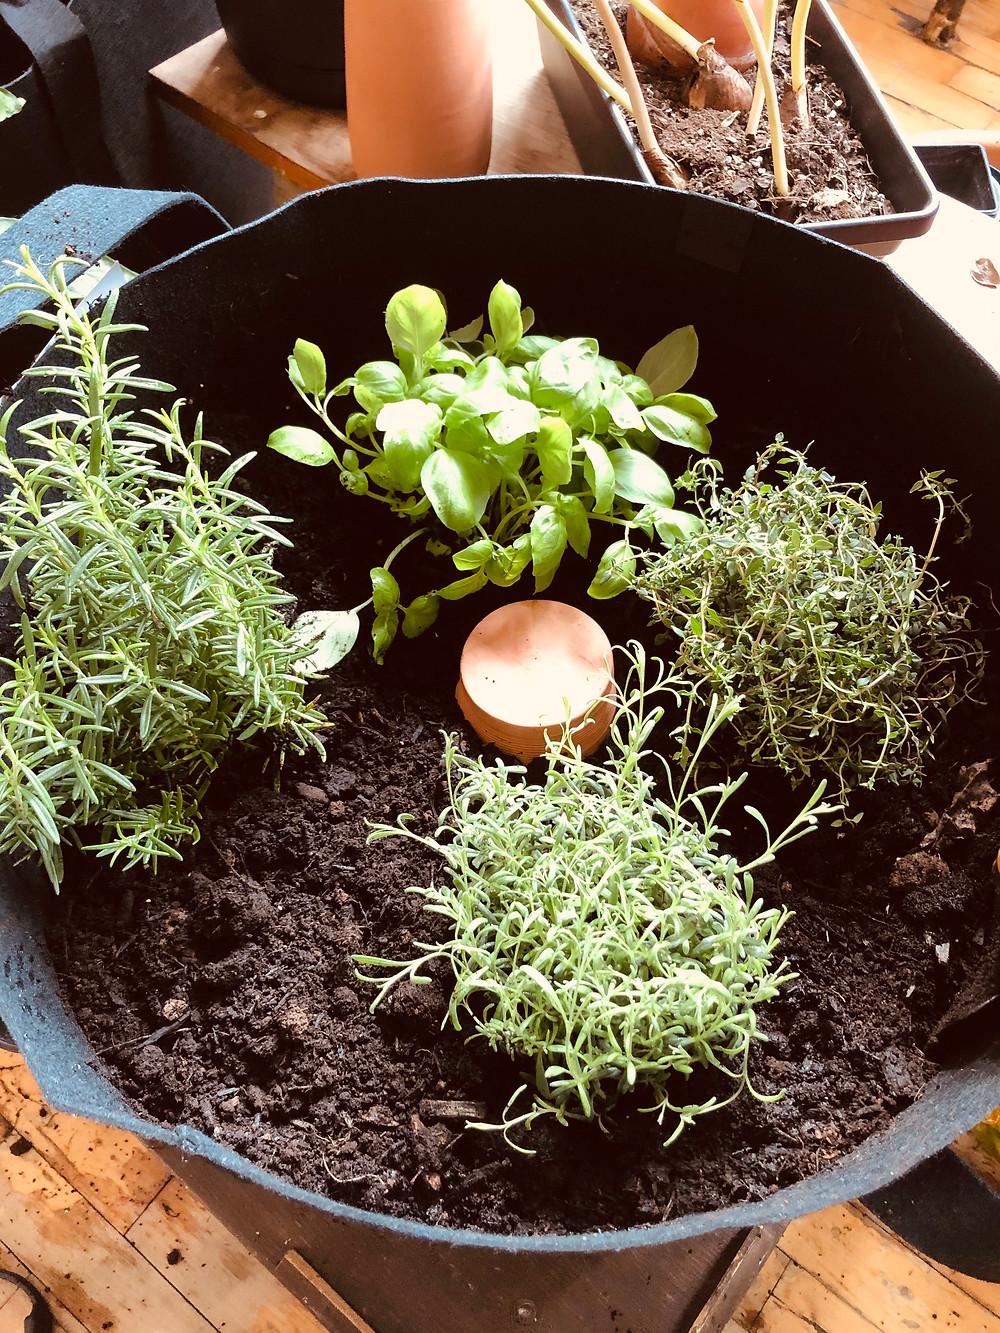 un Olla ou Oïa dans un pot de fines herbes